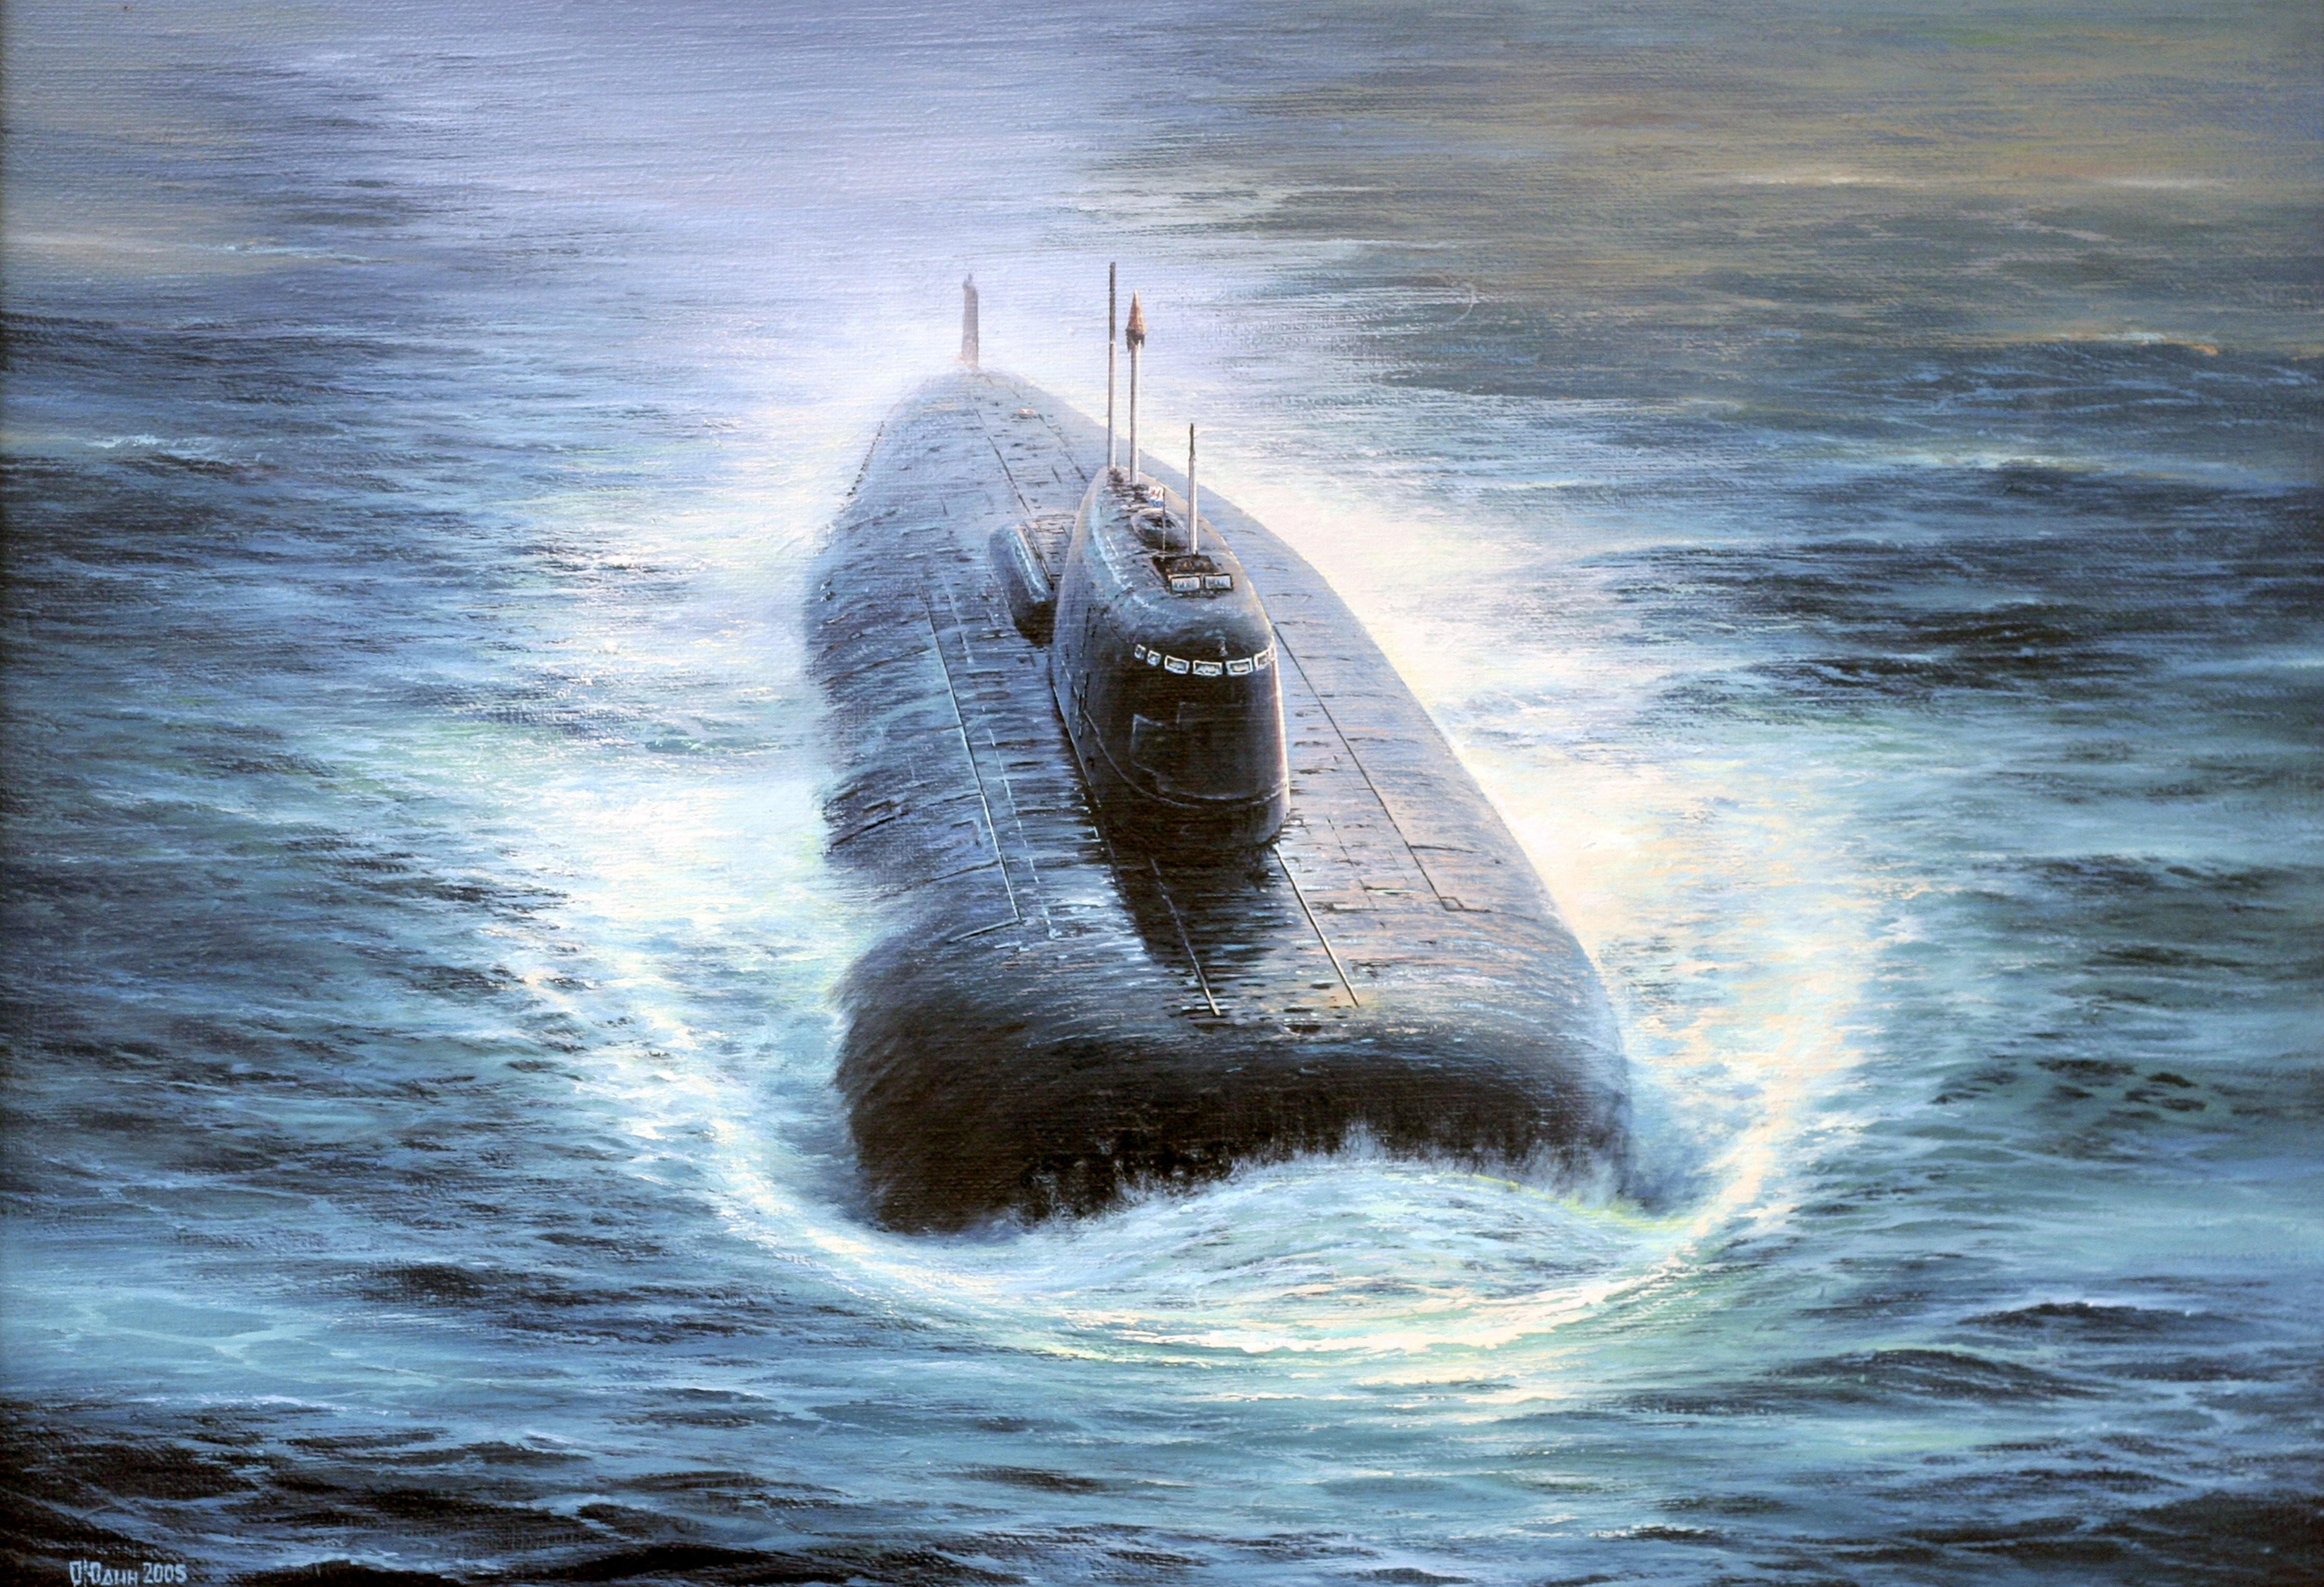 nuclear russian submarine 4843x3307 wallpaper Wallpaper 4843x3307